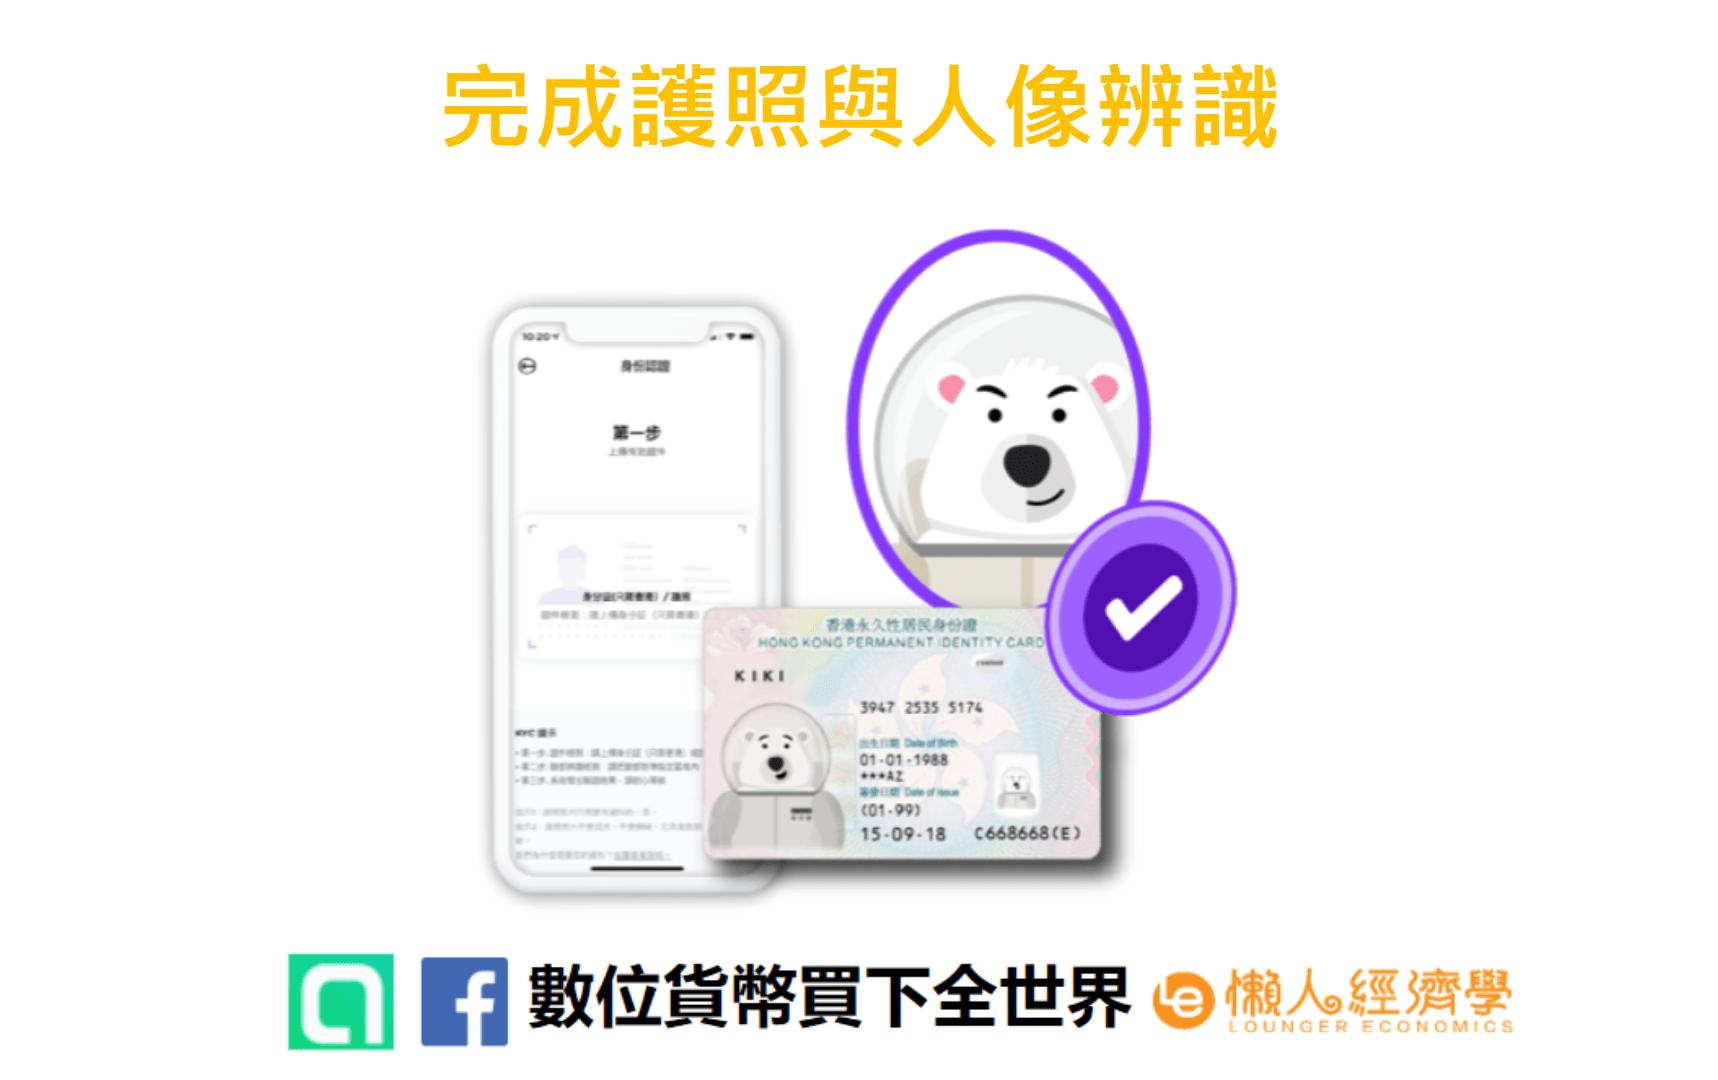 KIKITRADE開戶教學:完成護照、人像驗證